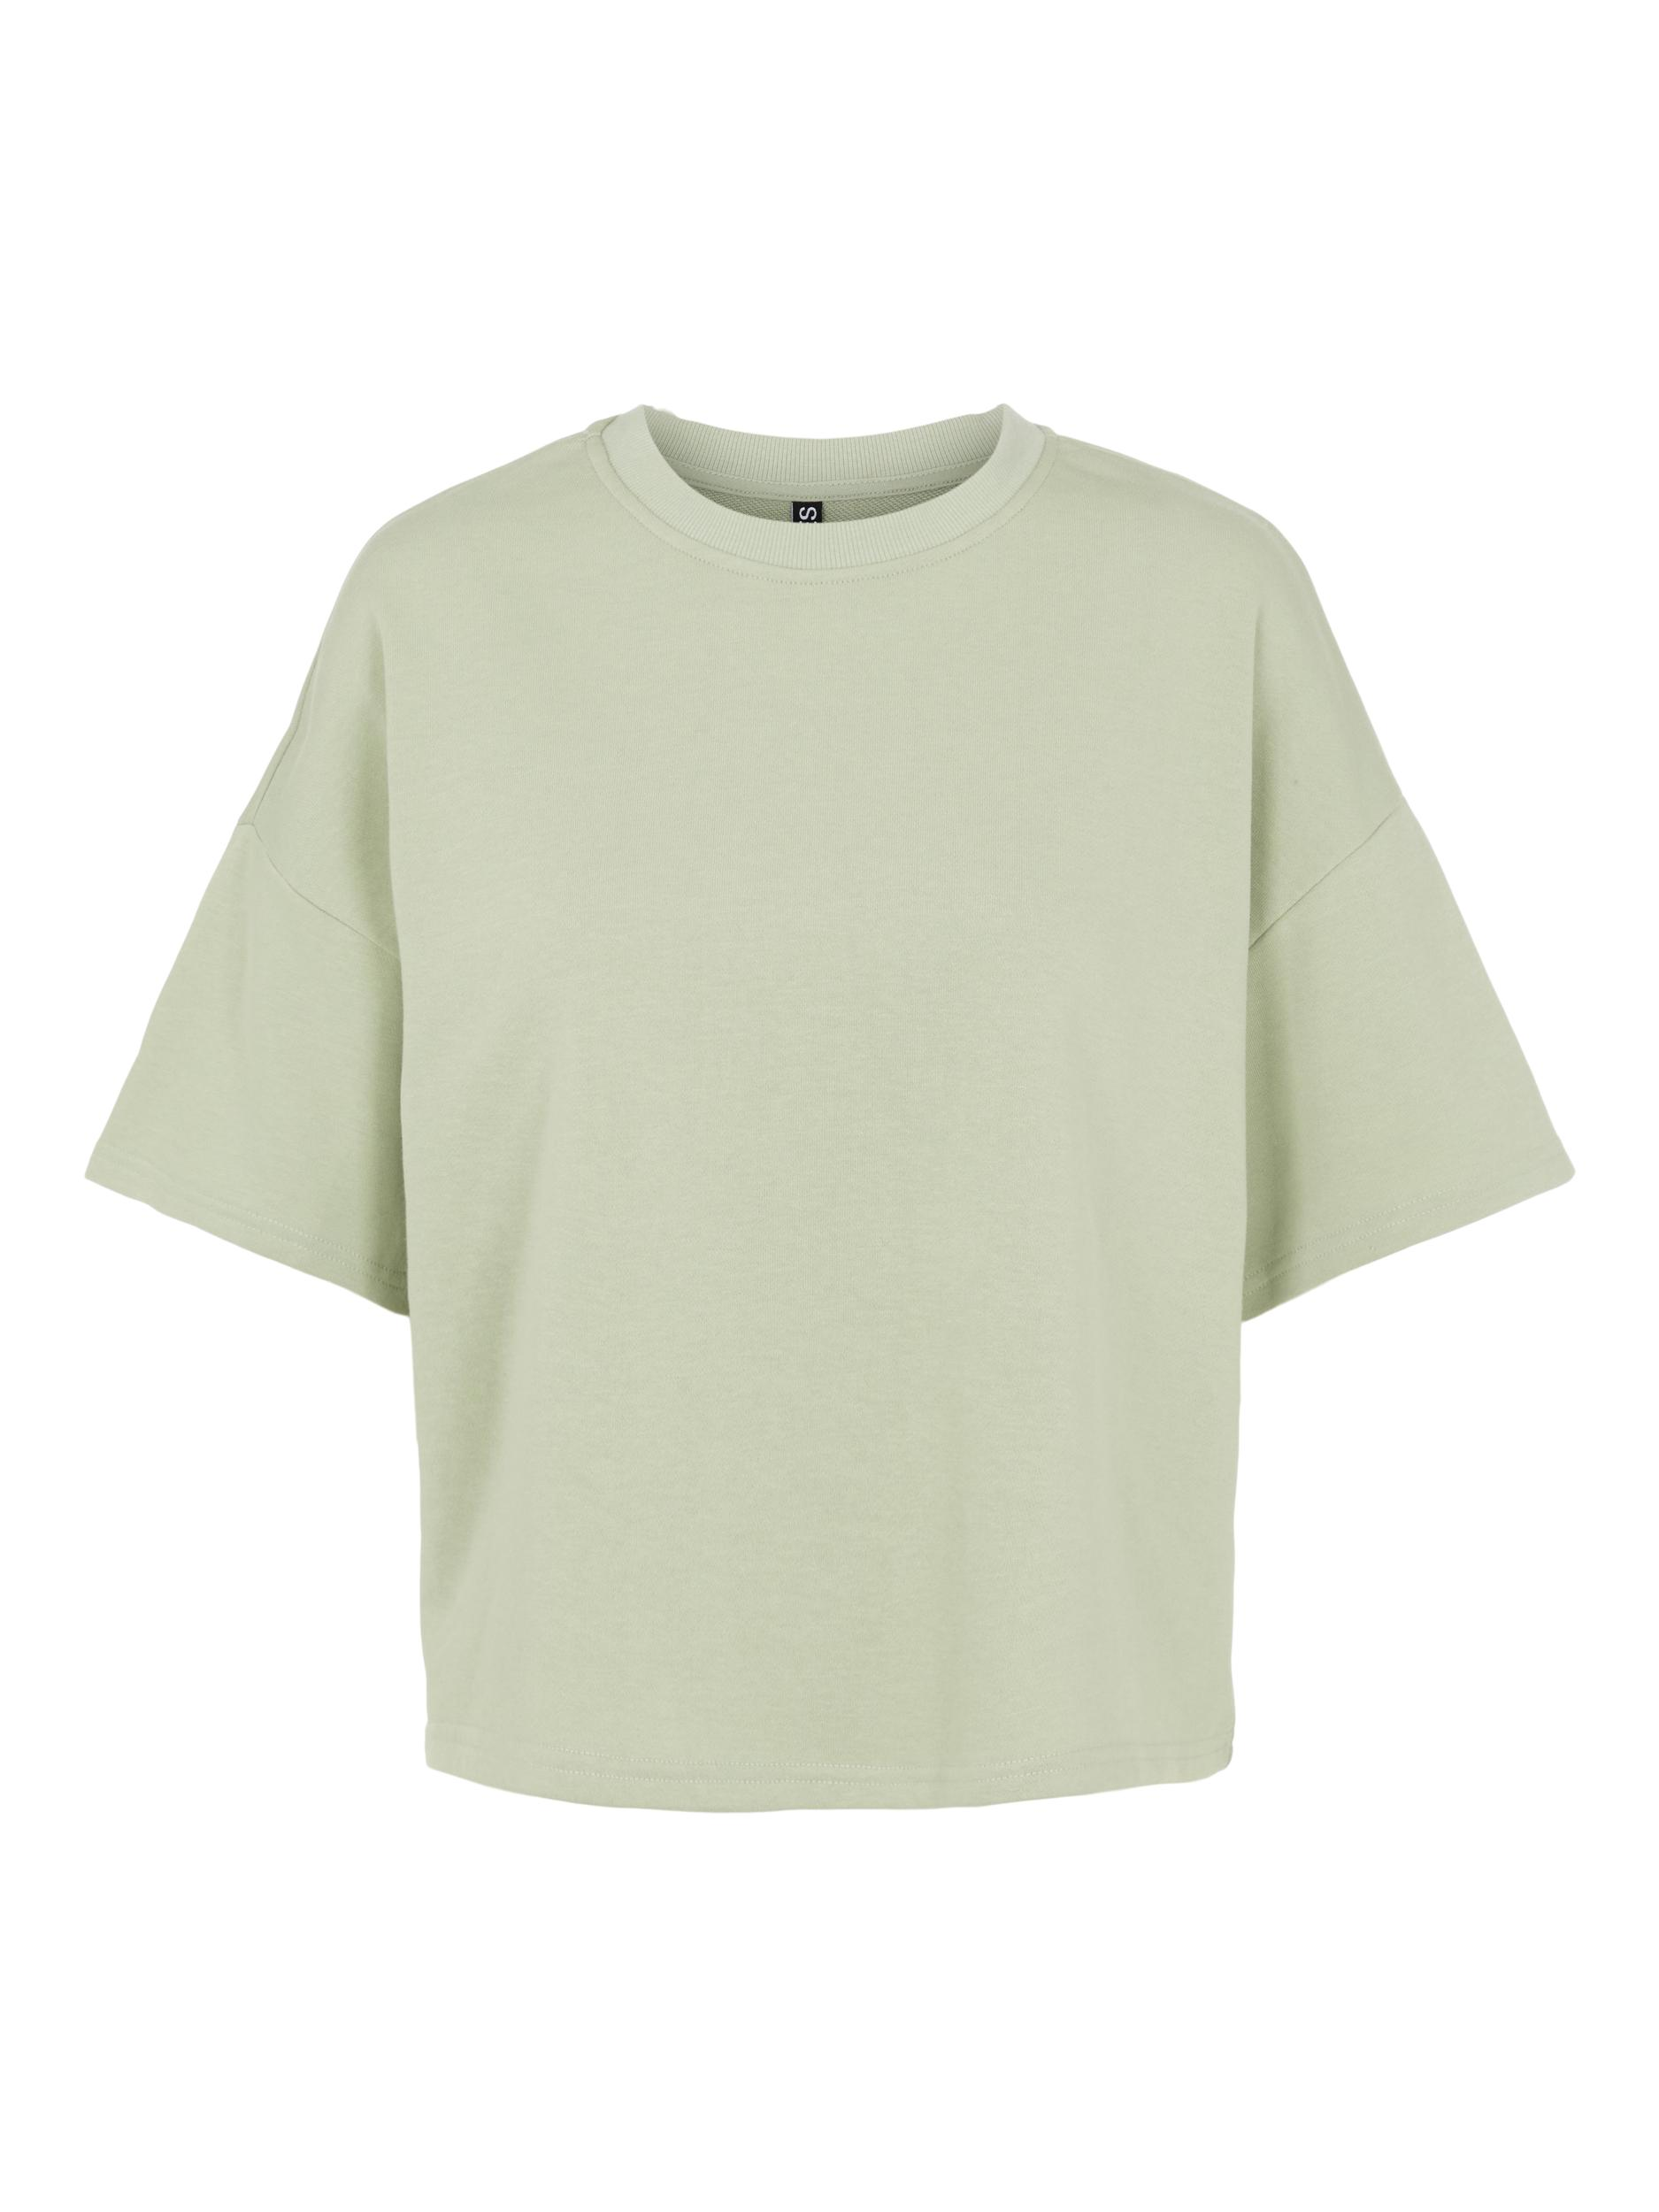 Pieces Chilli Summer t-shirt